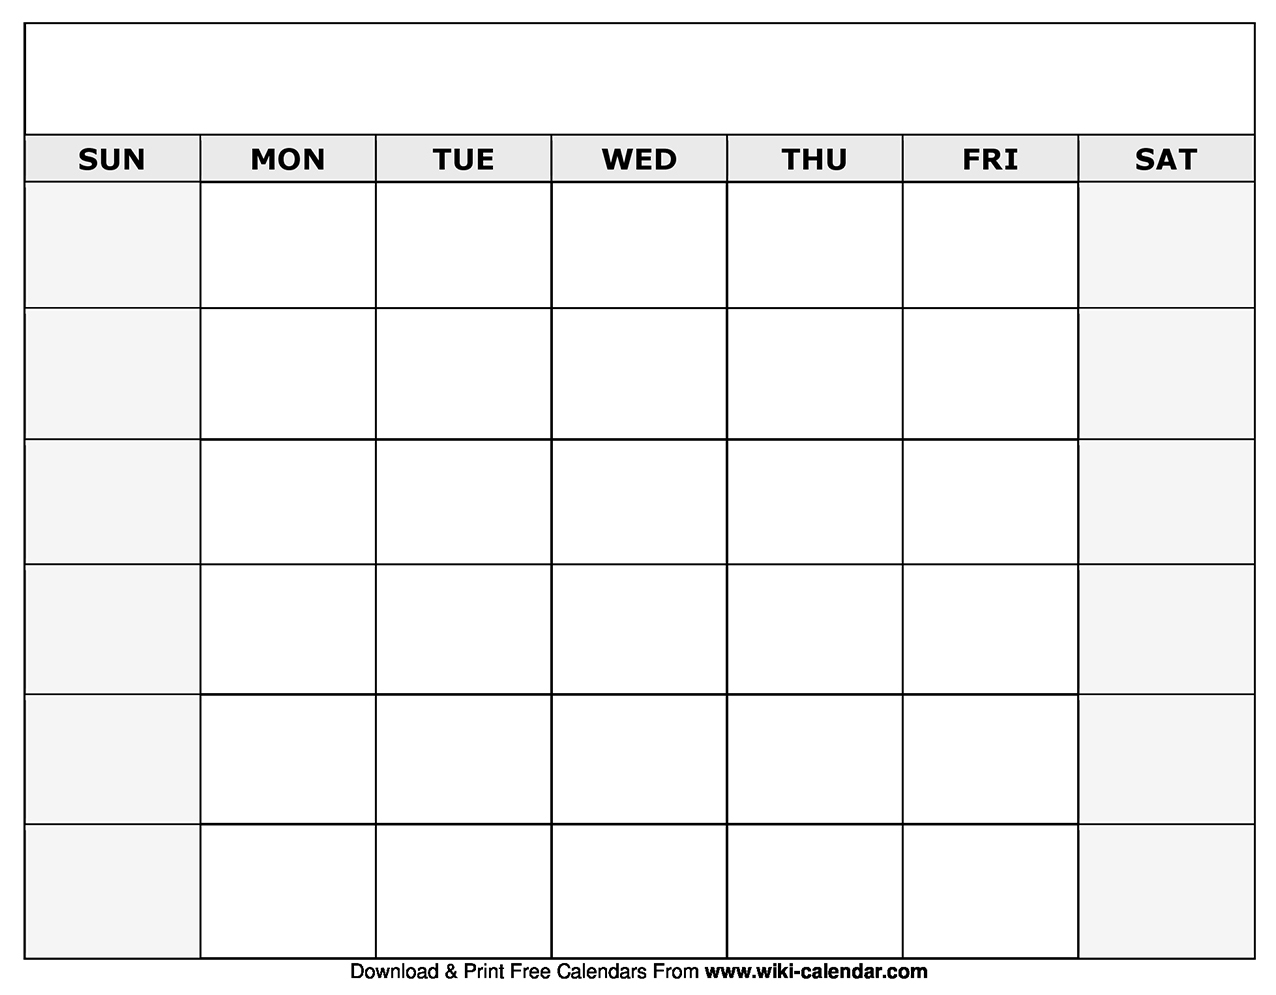 Blank Monthly Calendars To Print - Calendar Inspiration Design